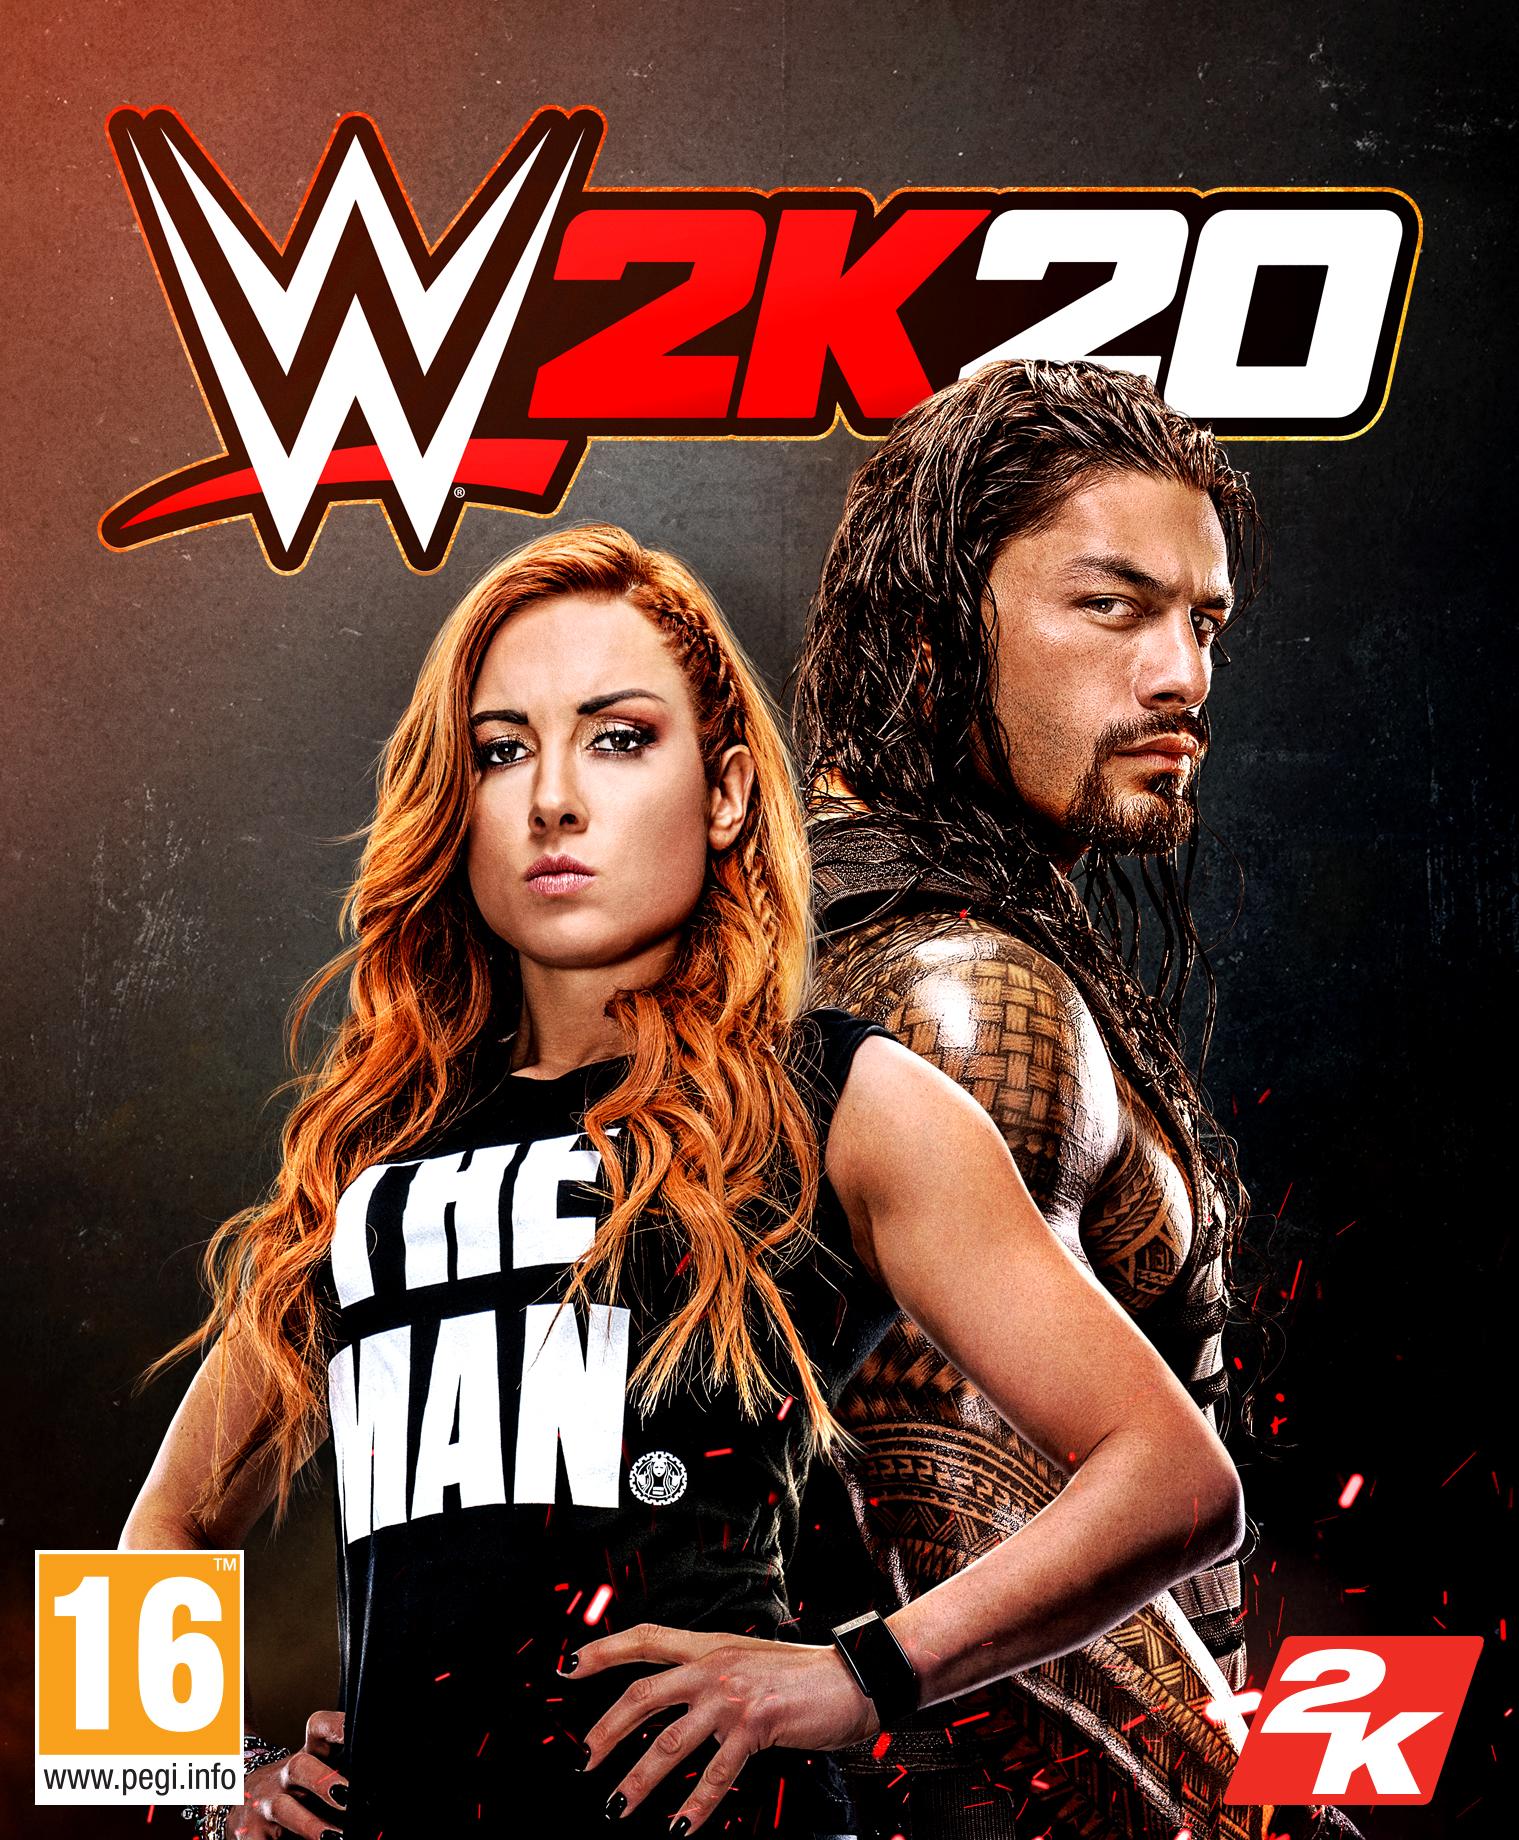 WWE 2K20 (PC) Klíč Steam (PC)